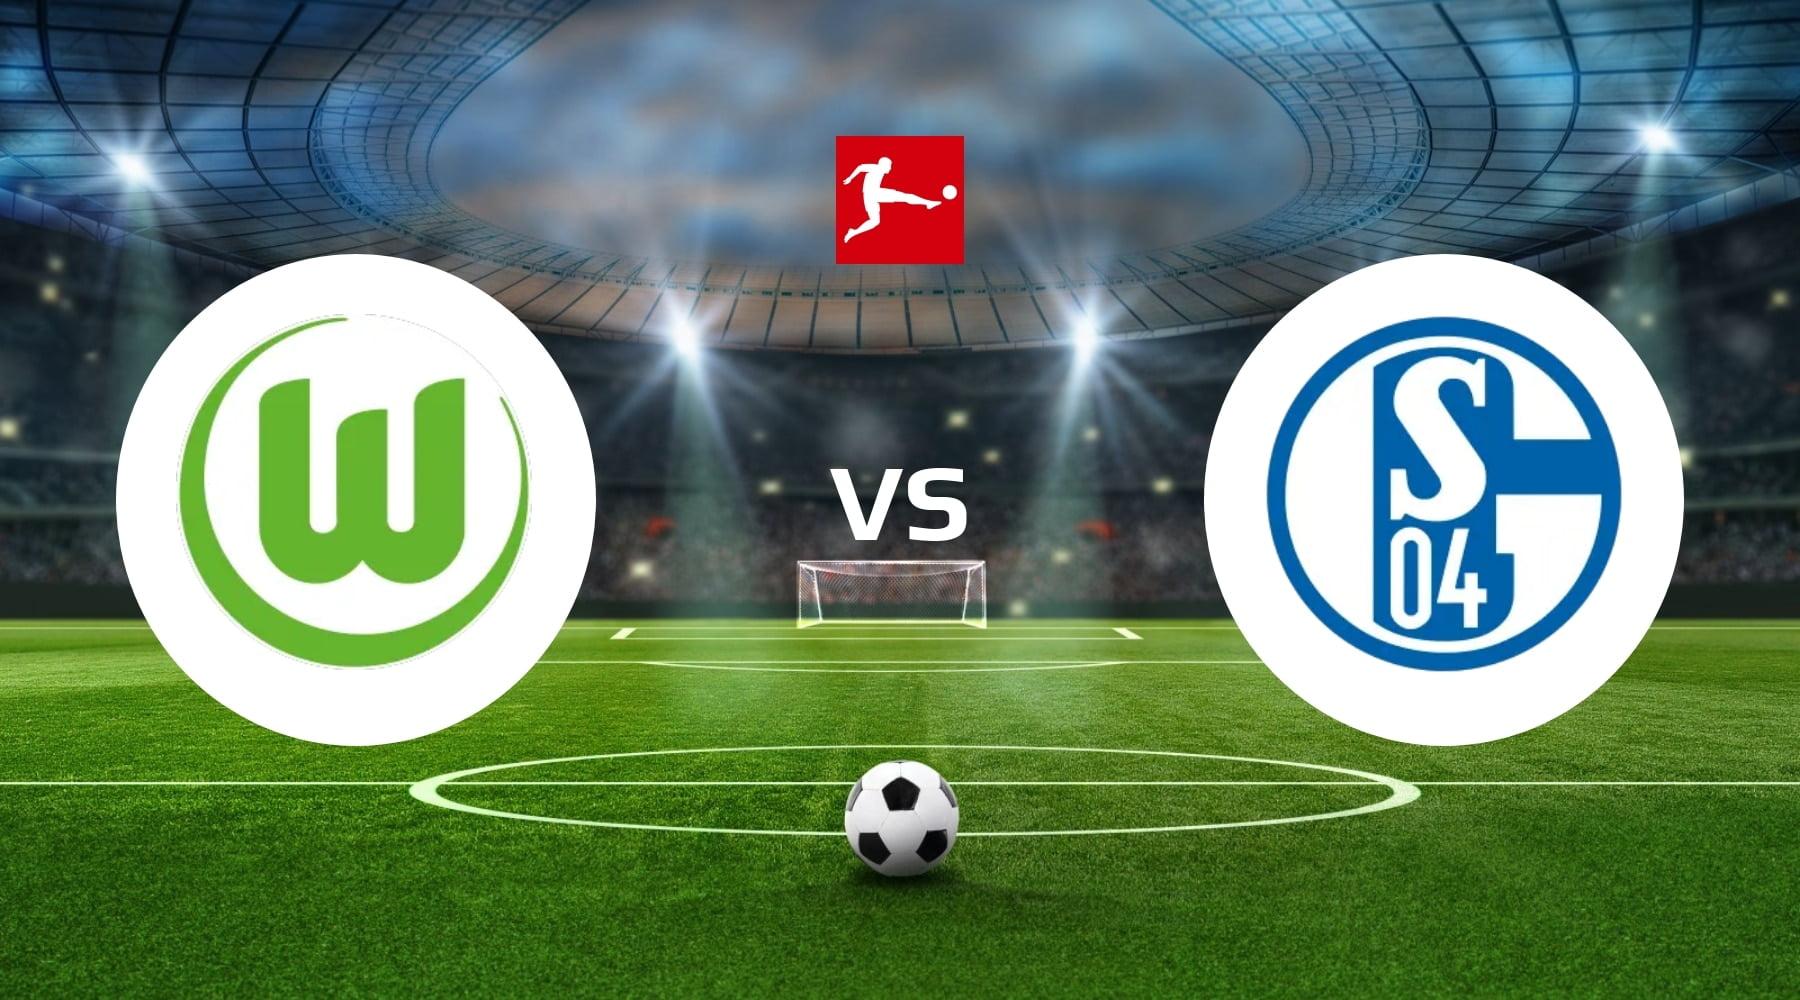 VfL Wolfsburg vs FC Schalke 04 Betting